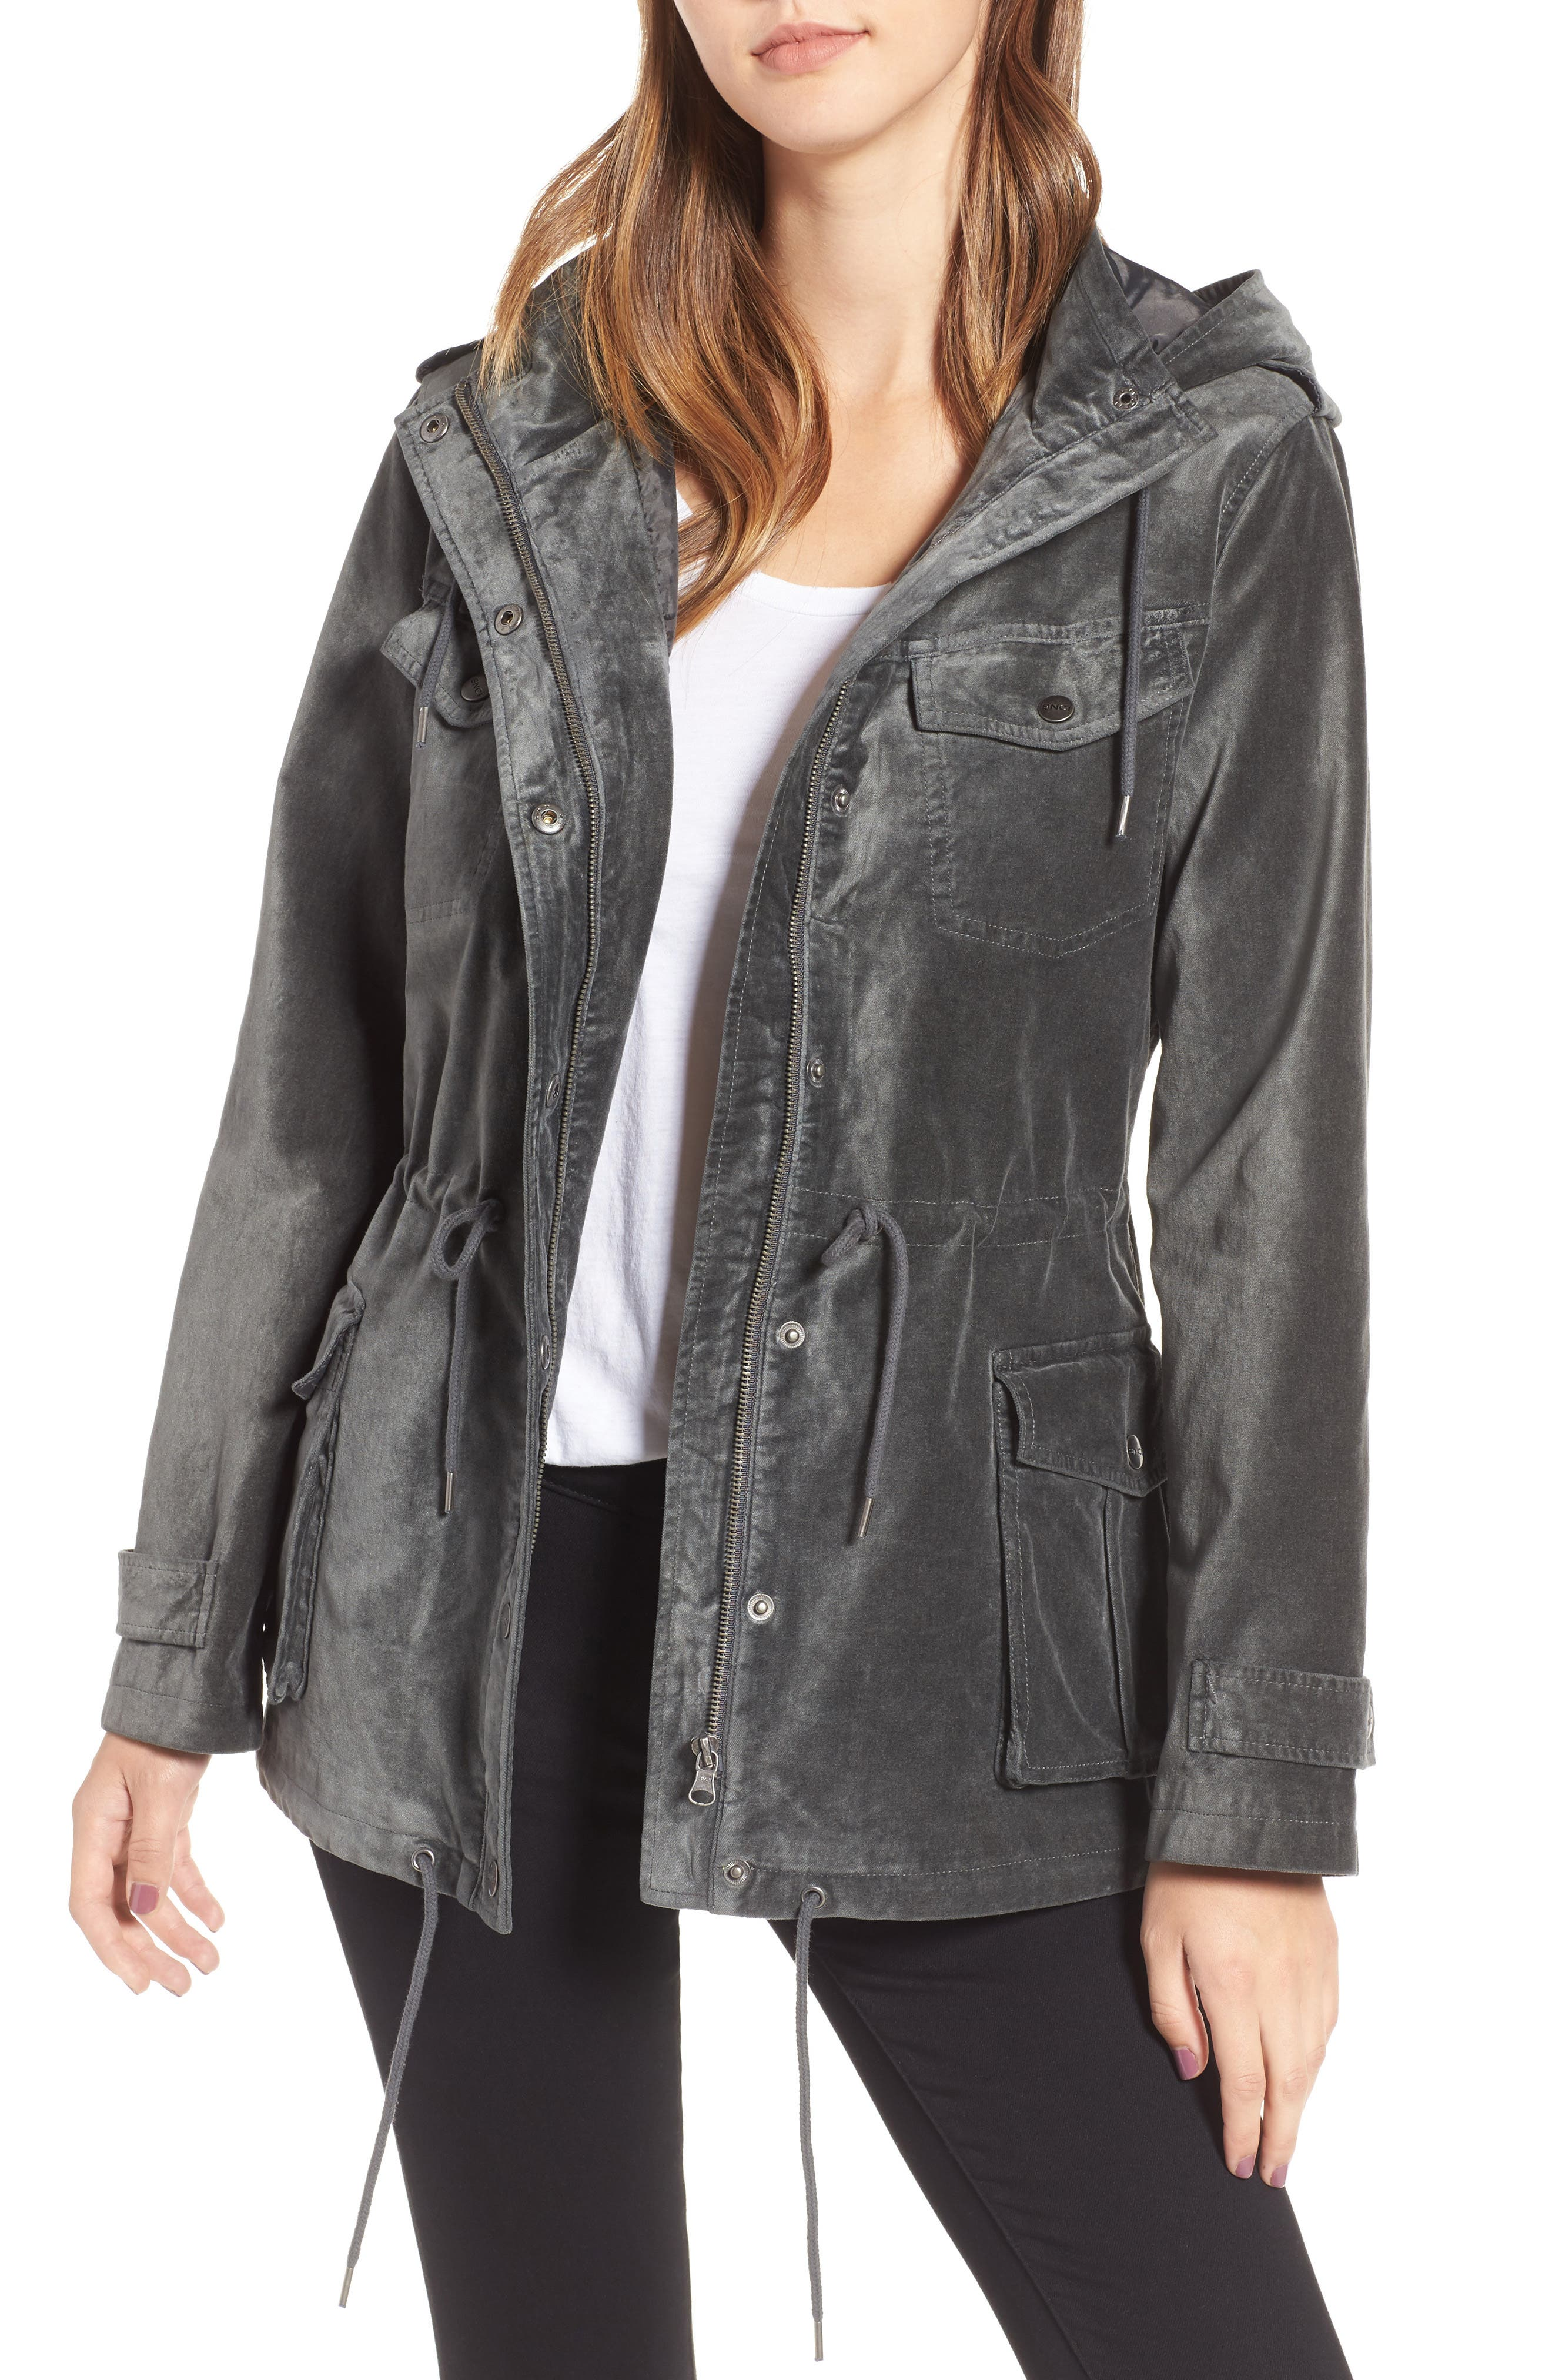 Main Image - BNCI Cotton Velveteen Hooded Anorak Jacket